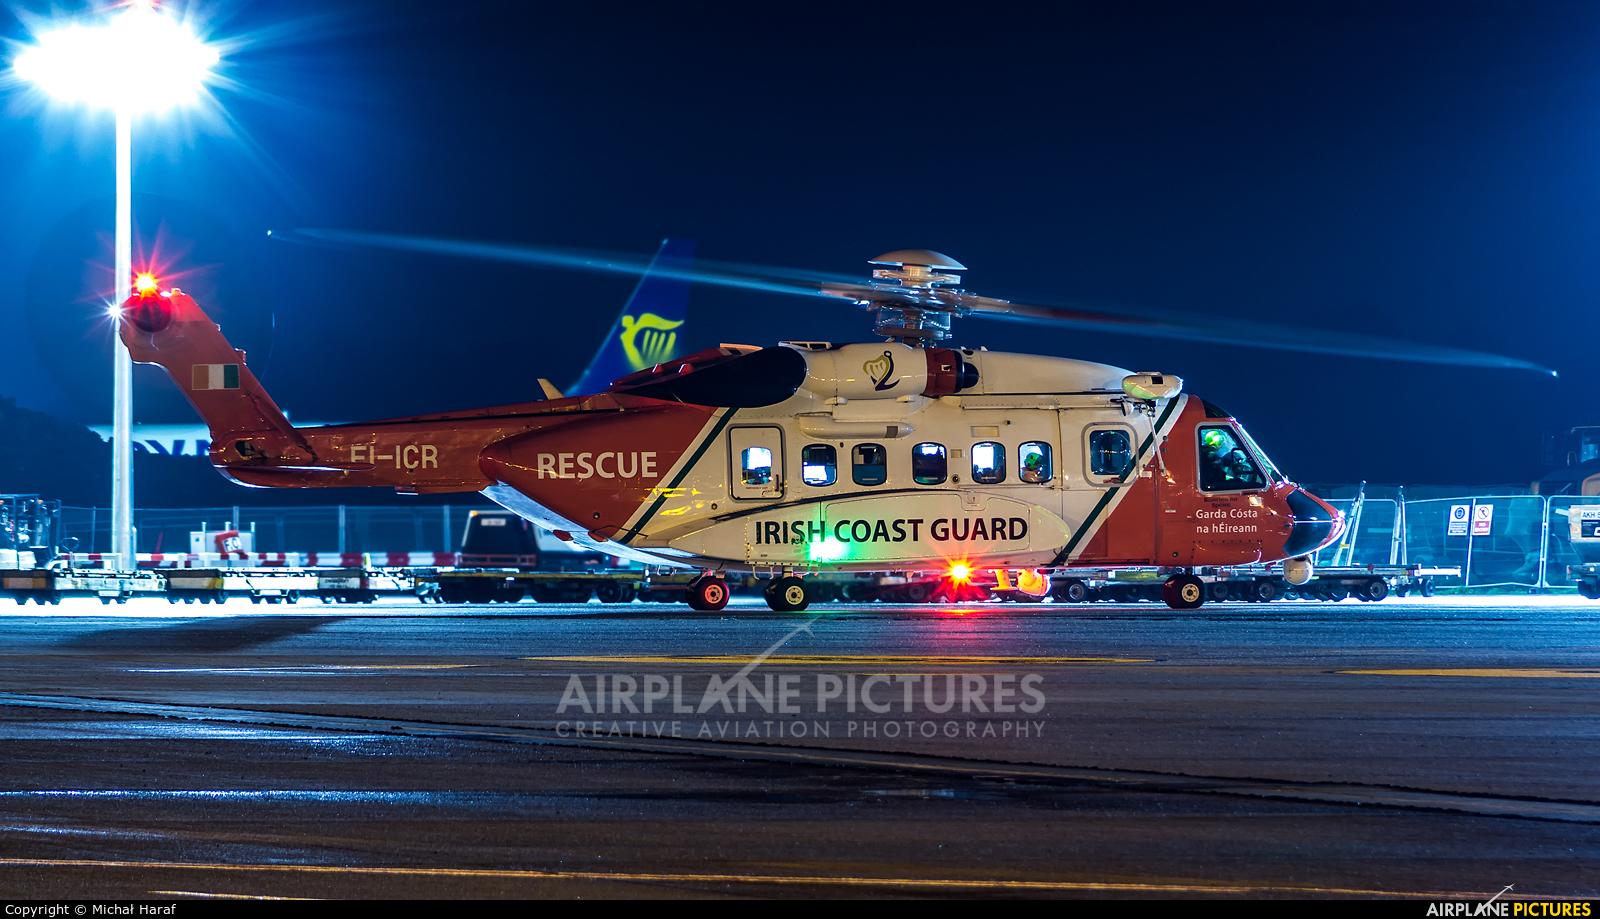 CHC Ireland EI-ICR aircraft at Dublin